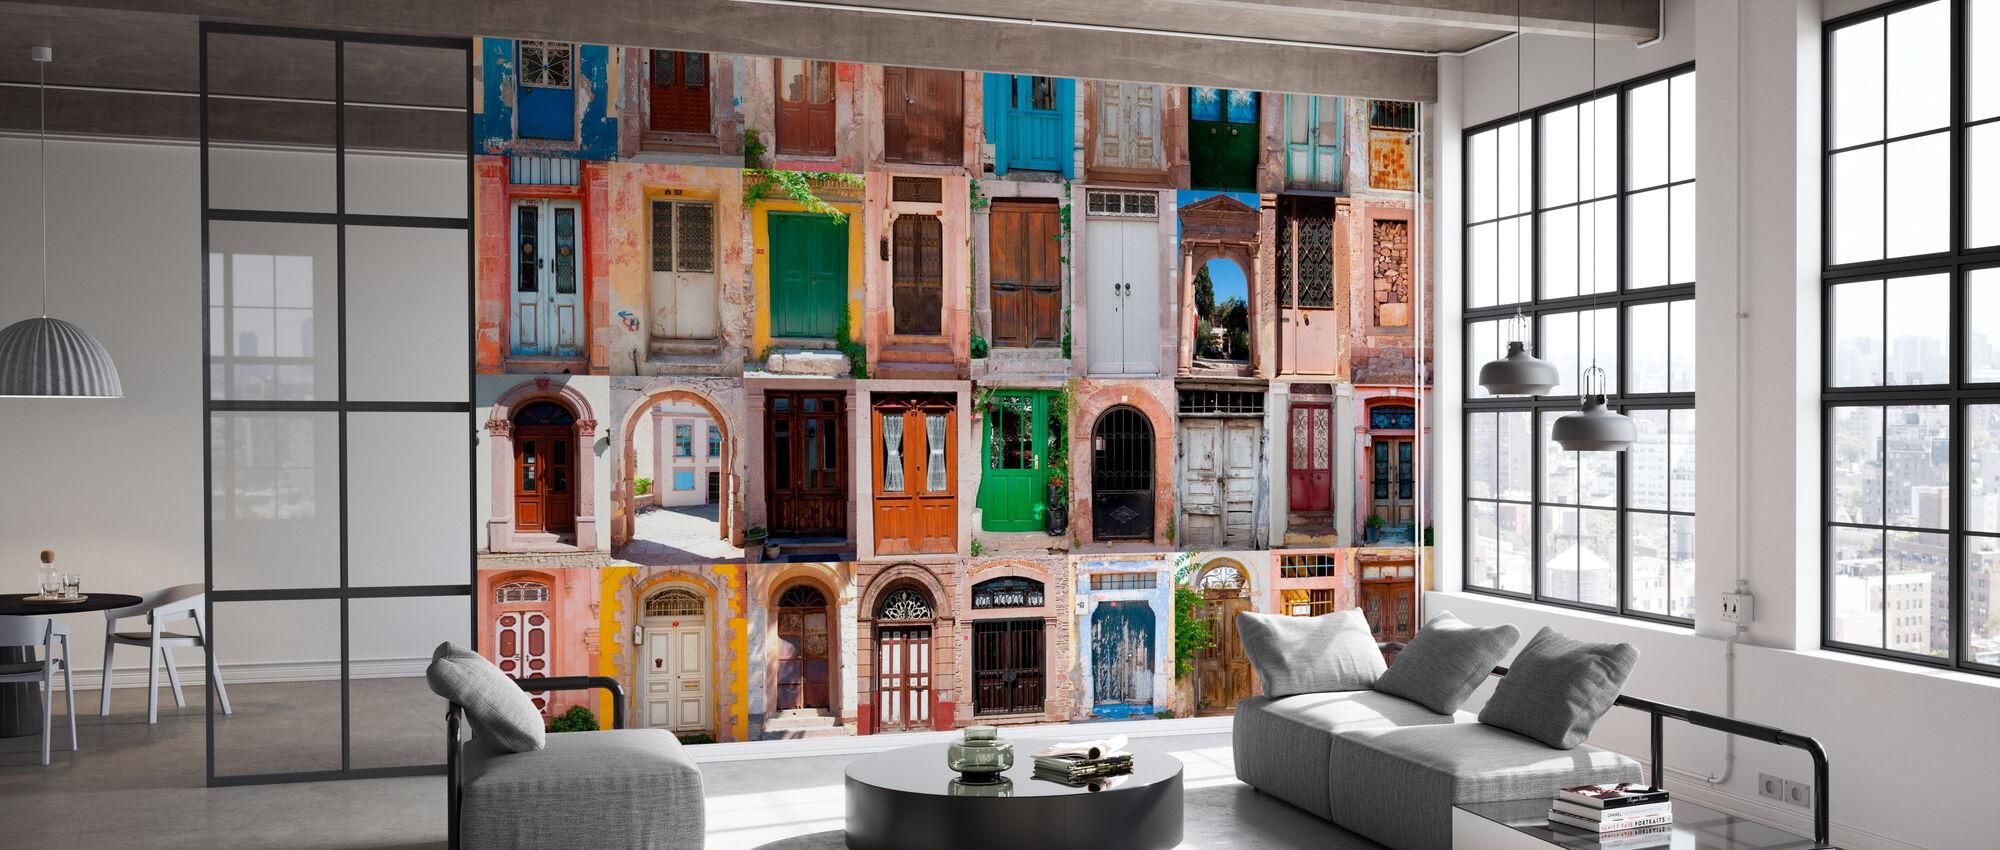 Colorful Doors - Wallpaper - Office